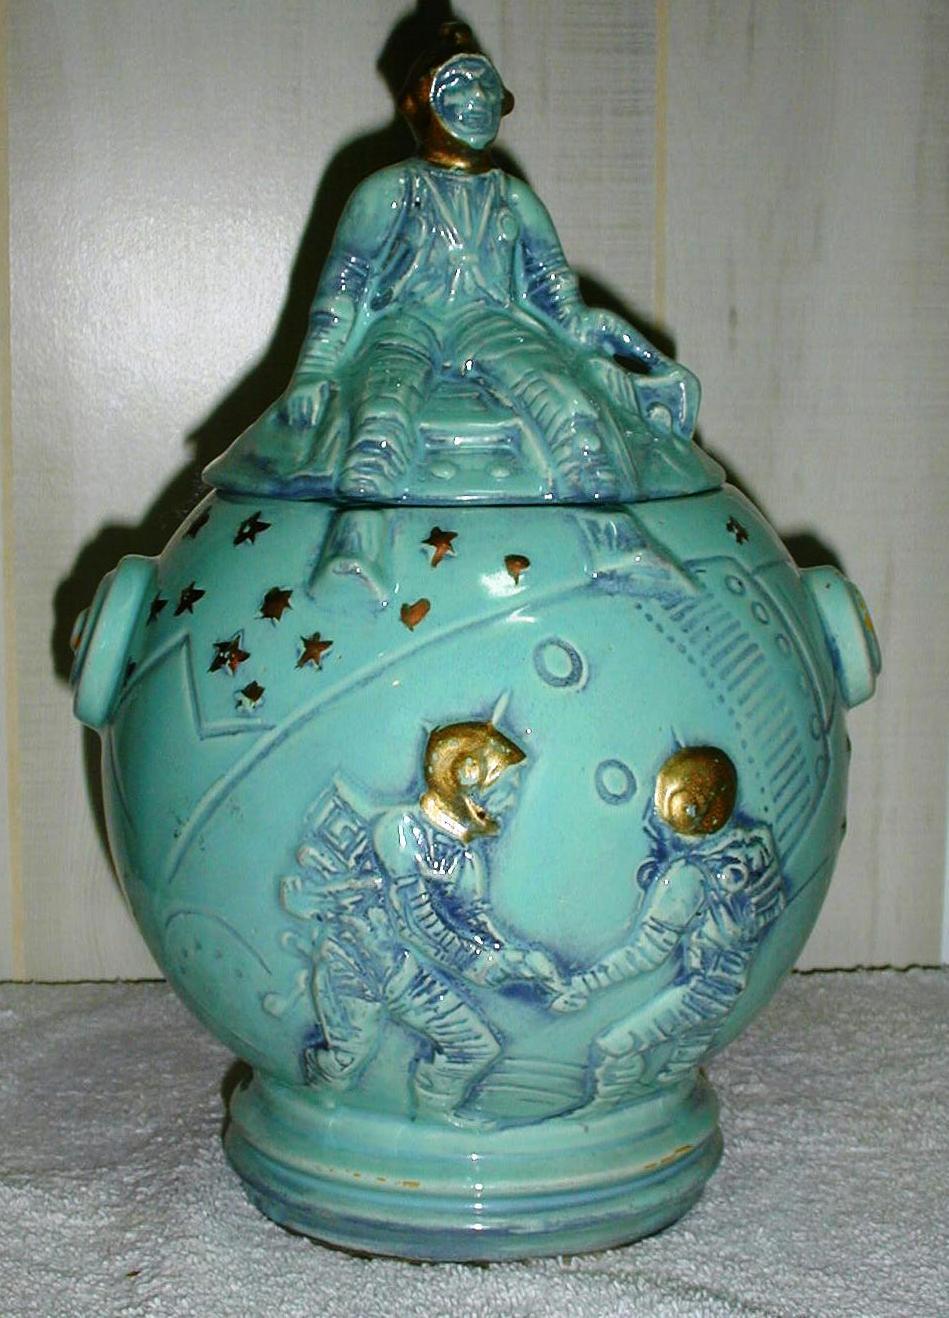 Astronaut Cookie Jar By Mc Coy Collector Cookie Jars